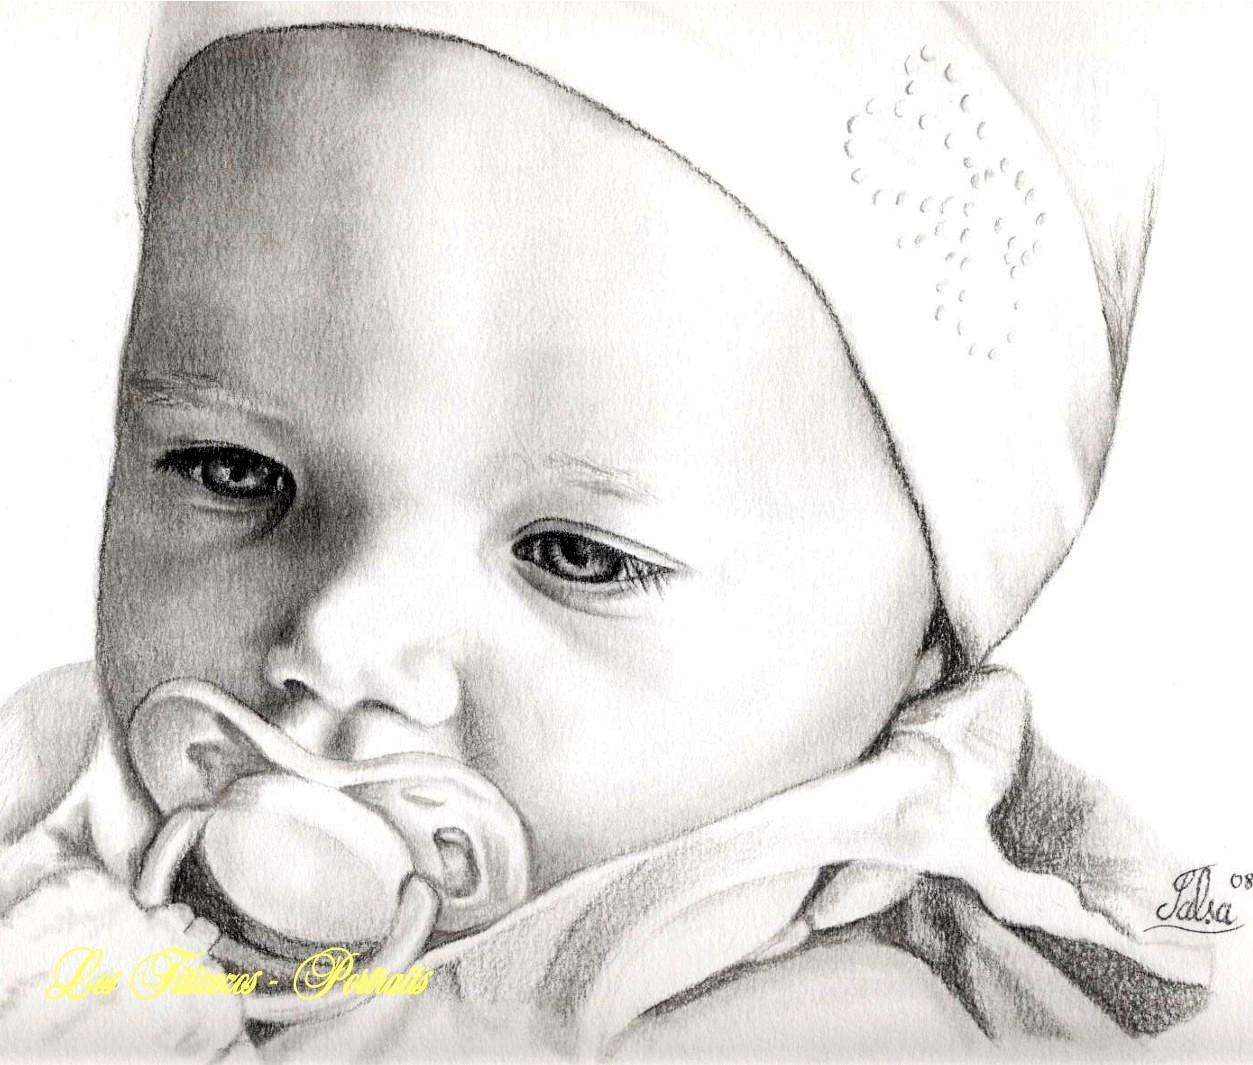 Dessin Ange Realiste dessins bébé